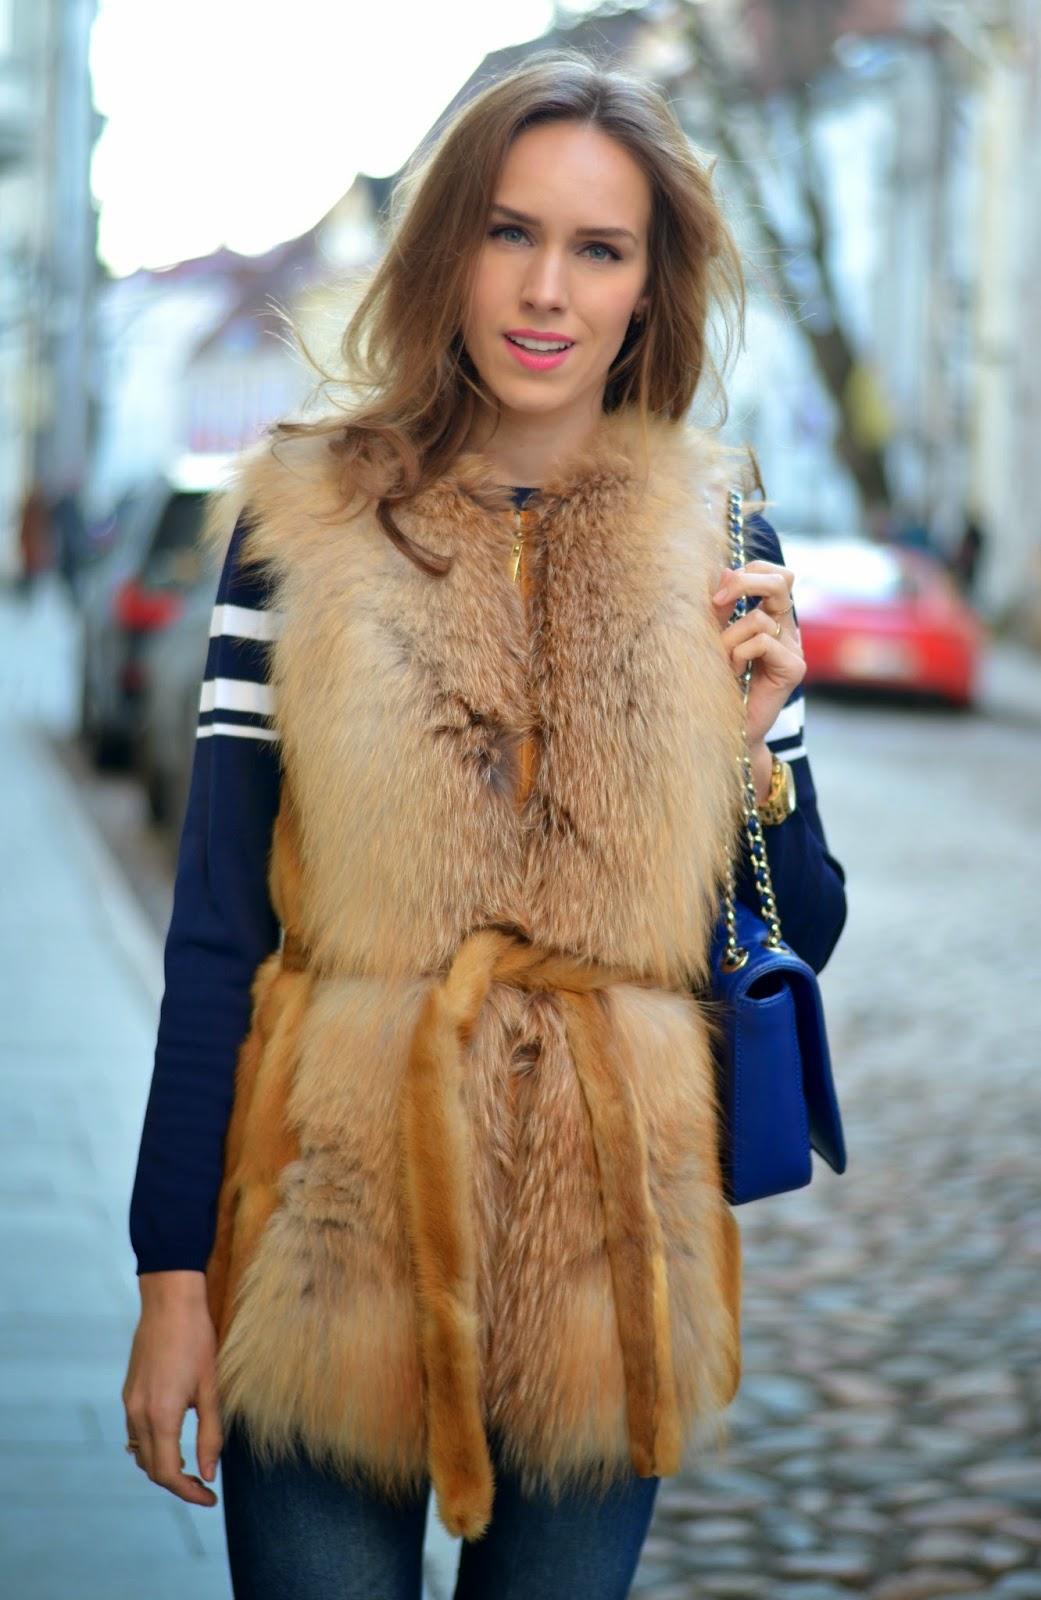 fashion-street-style-outfit-spring-2015-tan-fur-gilet kristjaana mere